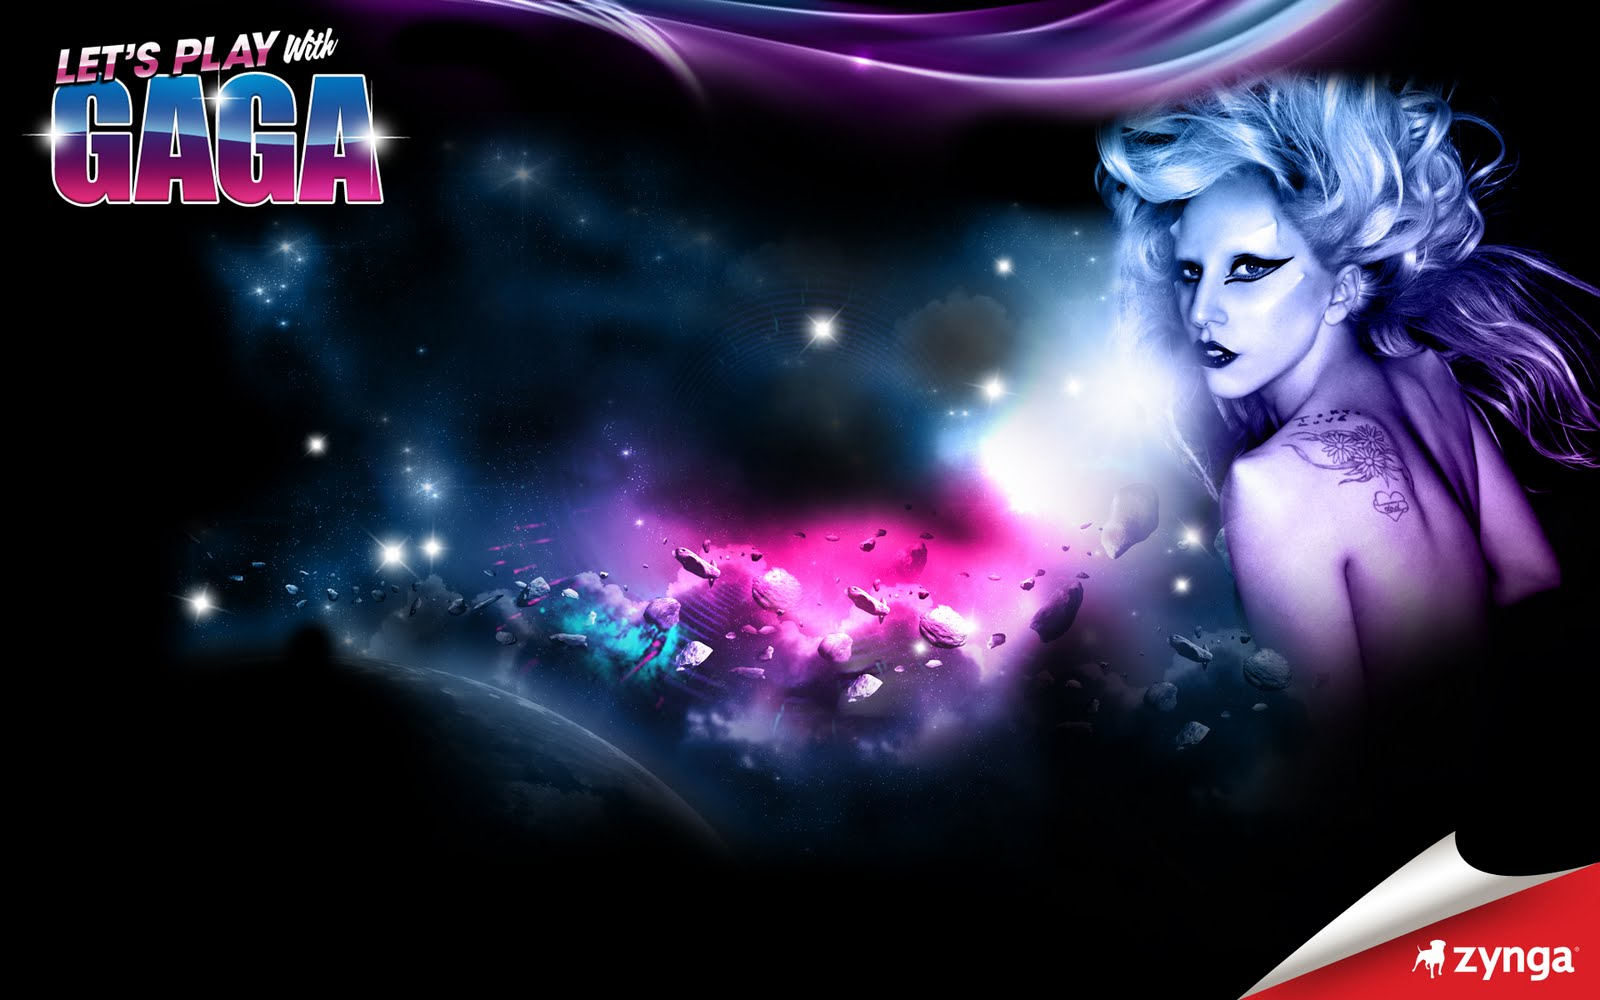 http://3.bp.blogspot.com/-5oMNPFK1yRk/TeHLFsV7kGI/AAAAAAAABO4/KxWpM23awJA/s1600/gaga-play.jpg